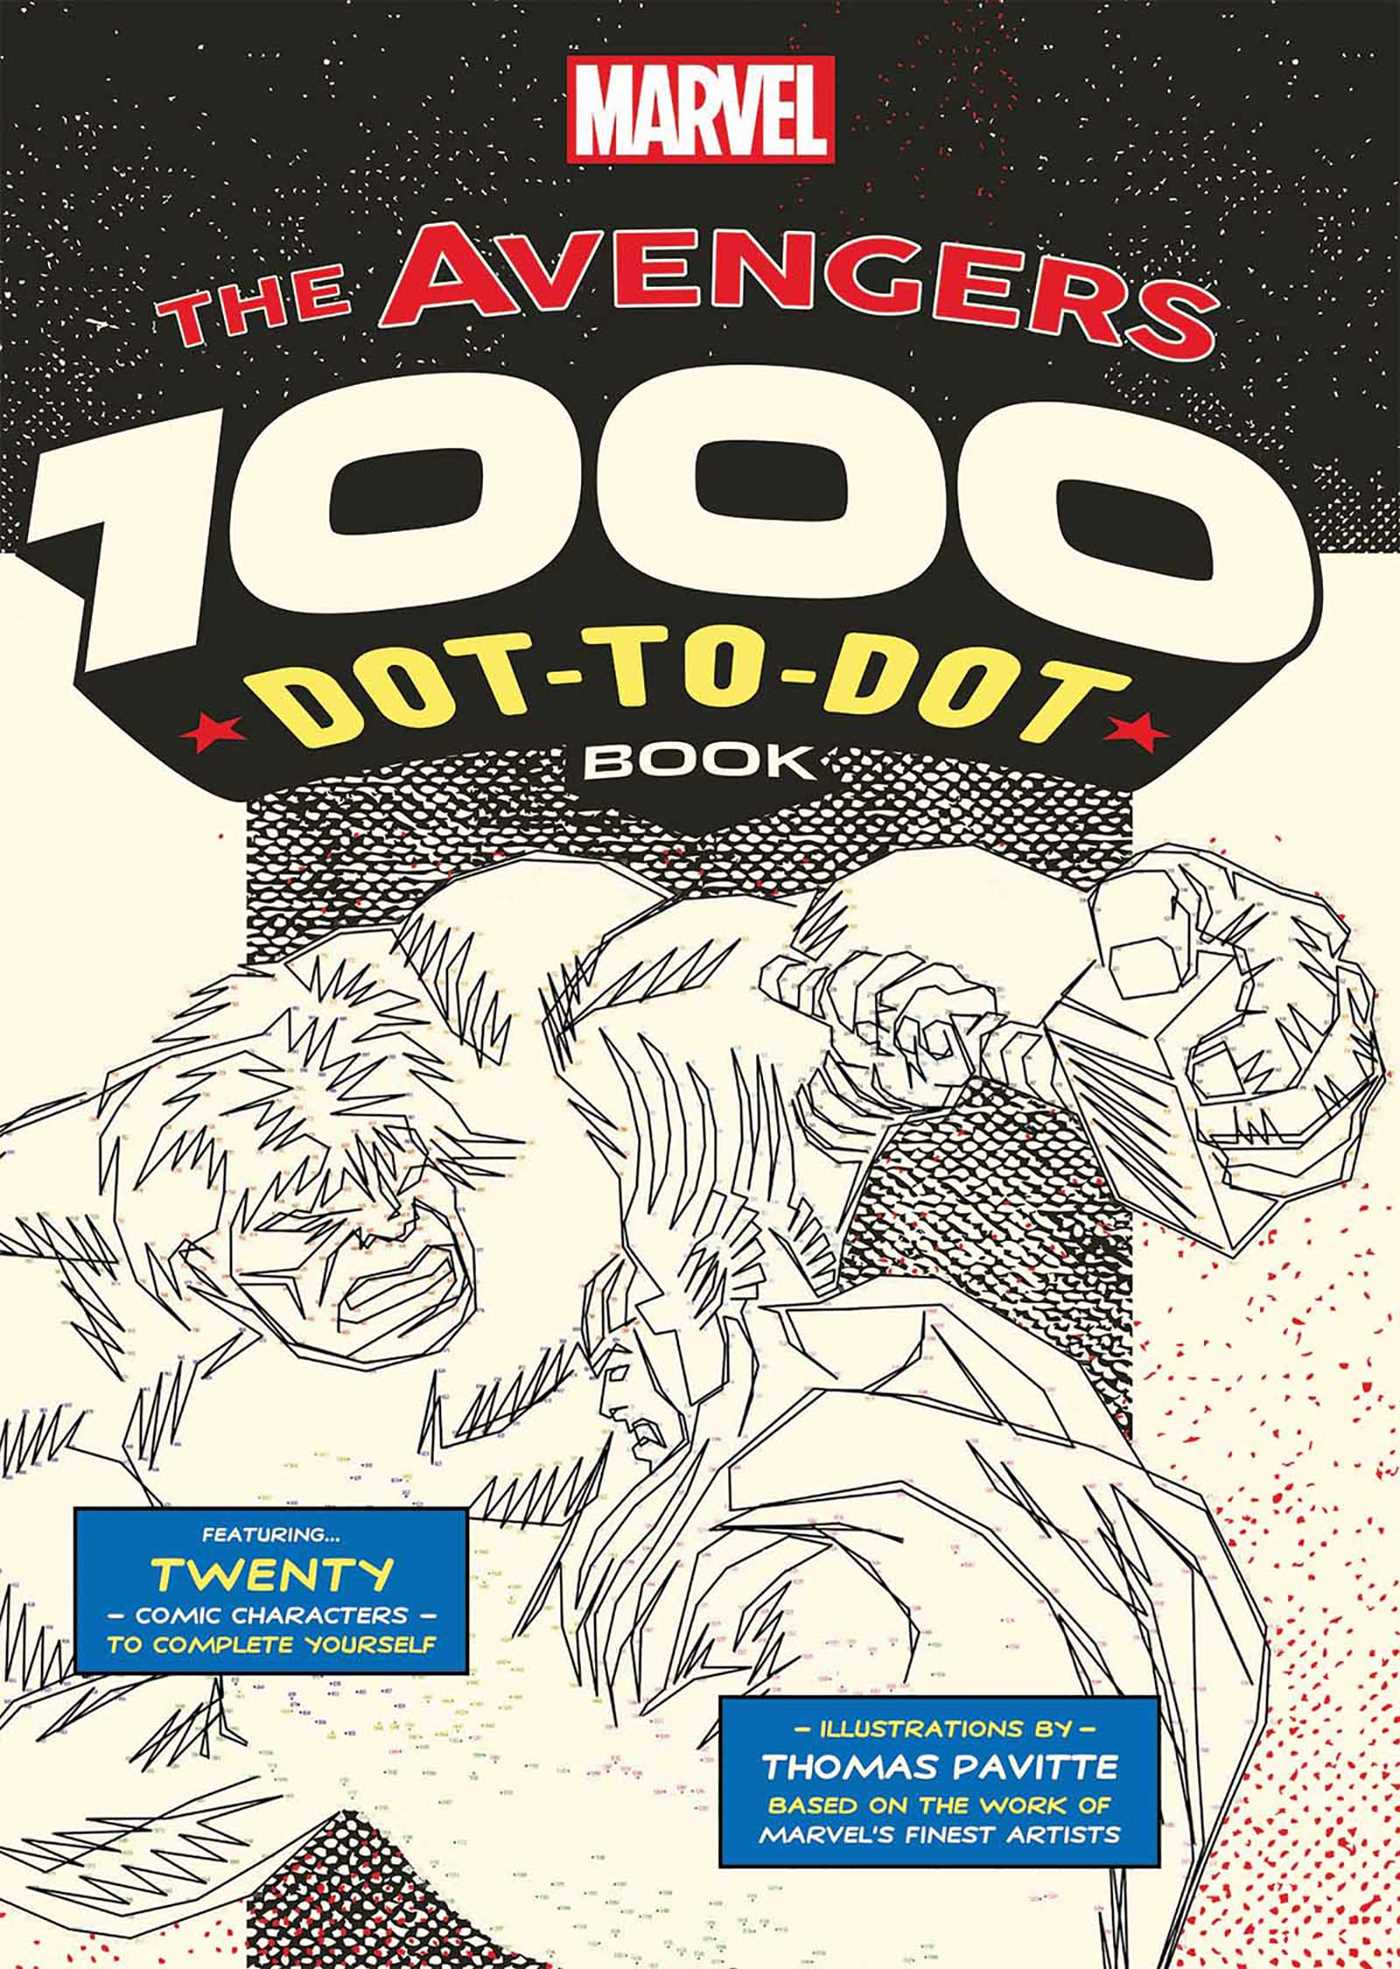 Marvel The Avengers 1000 Dot To Book 9781684122820 Hr